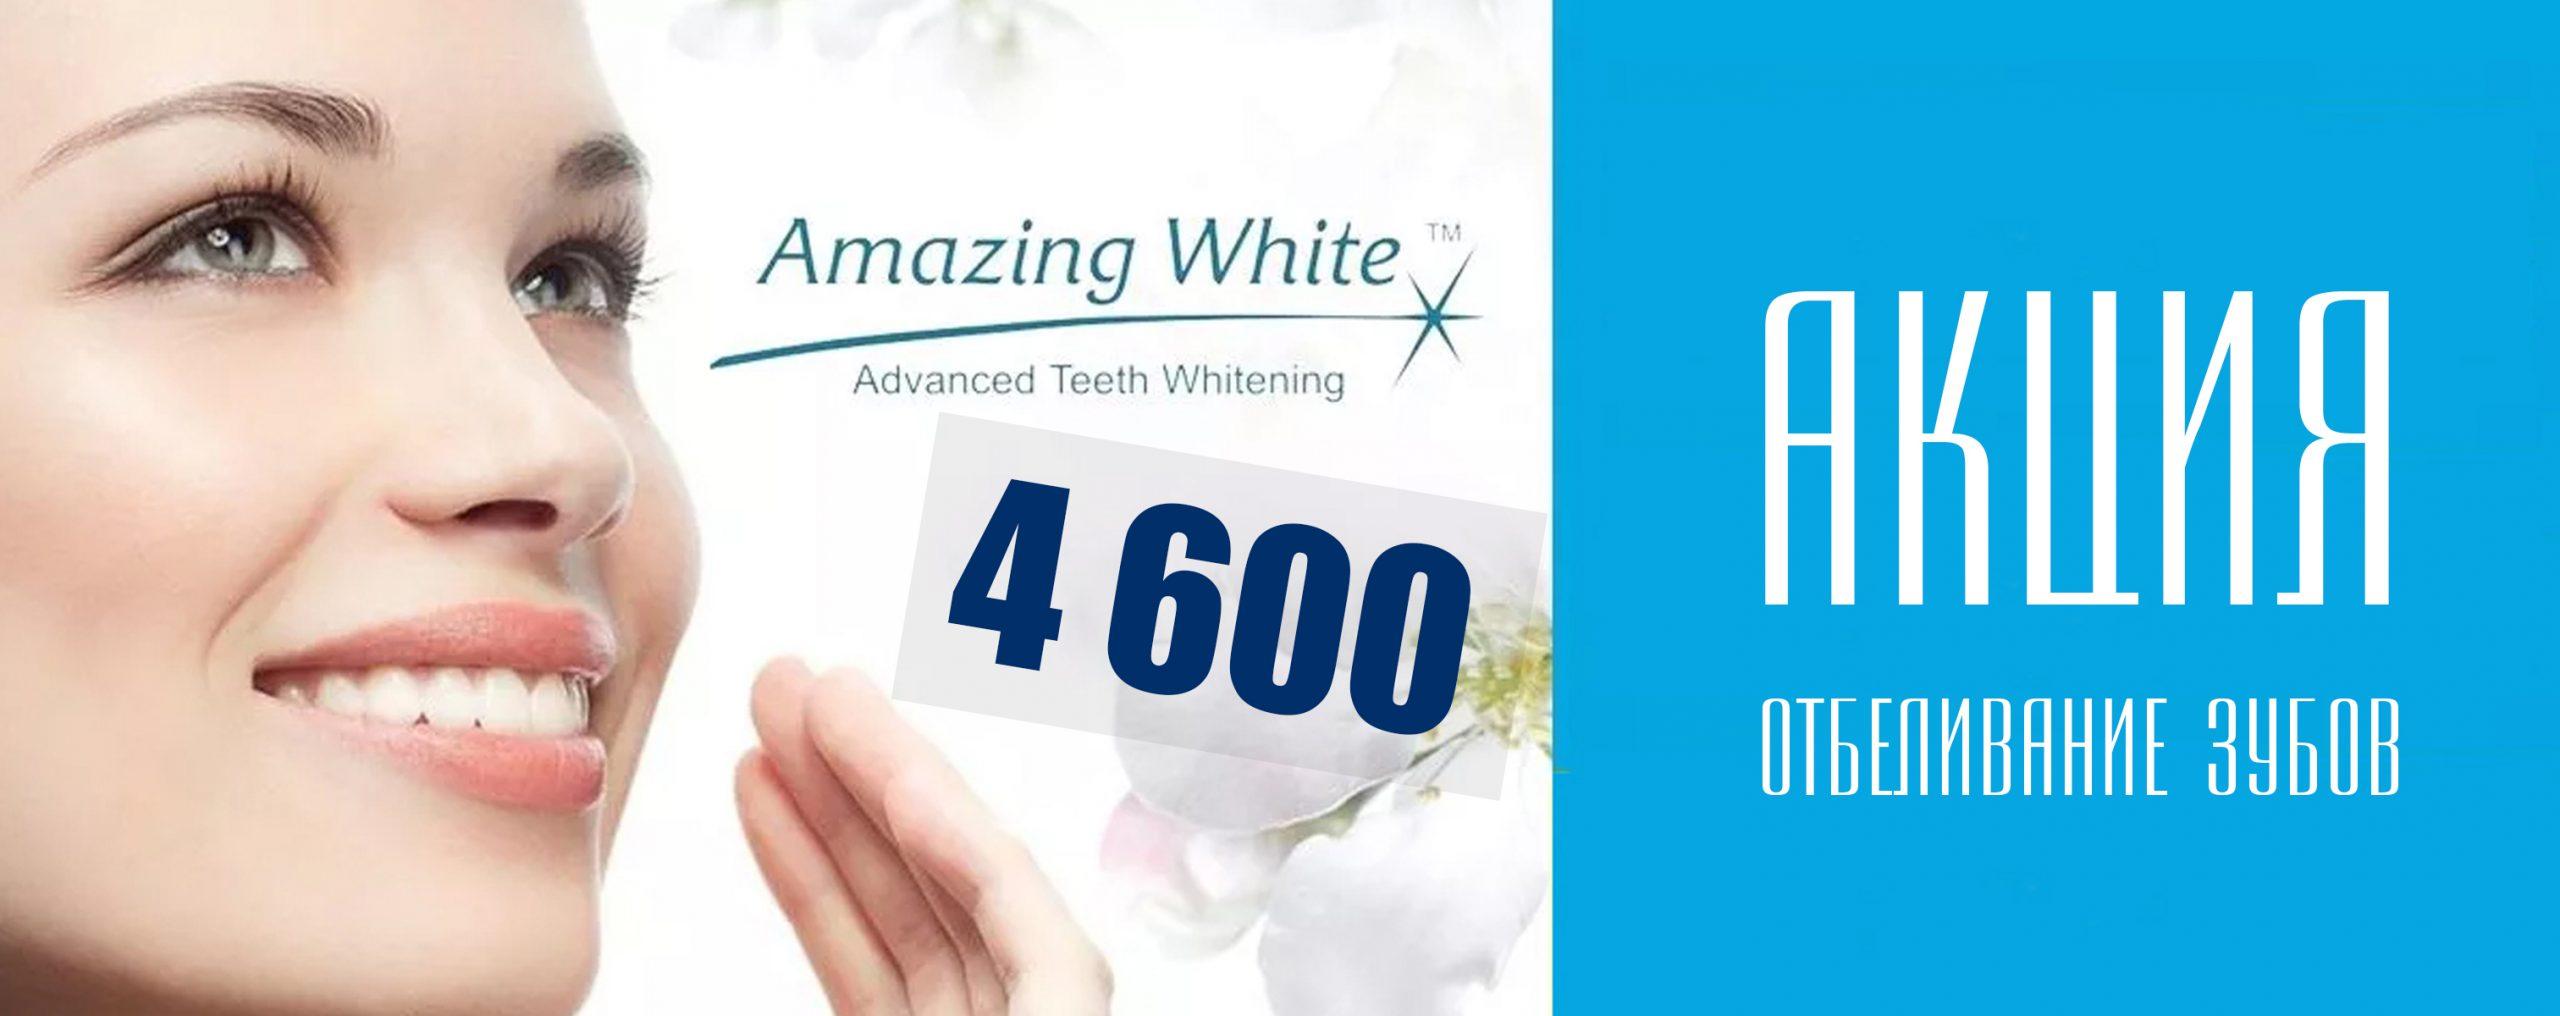 Отбеливание зубов Amazing White